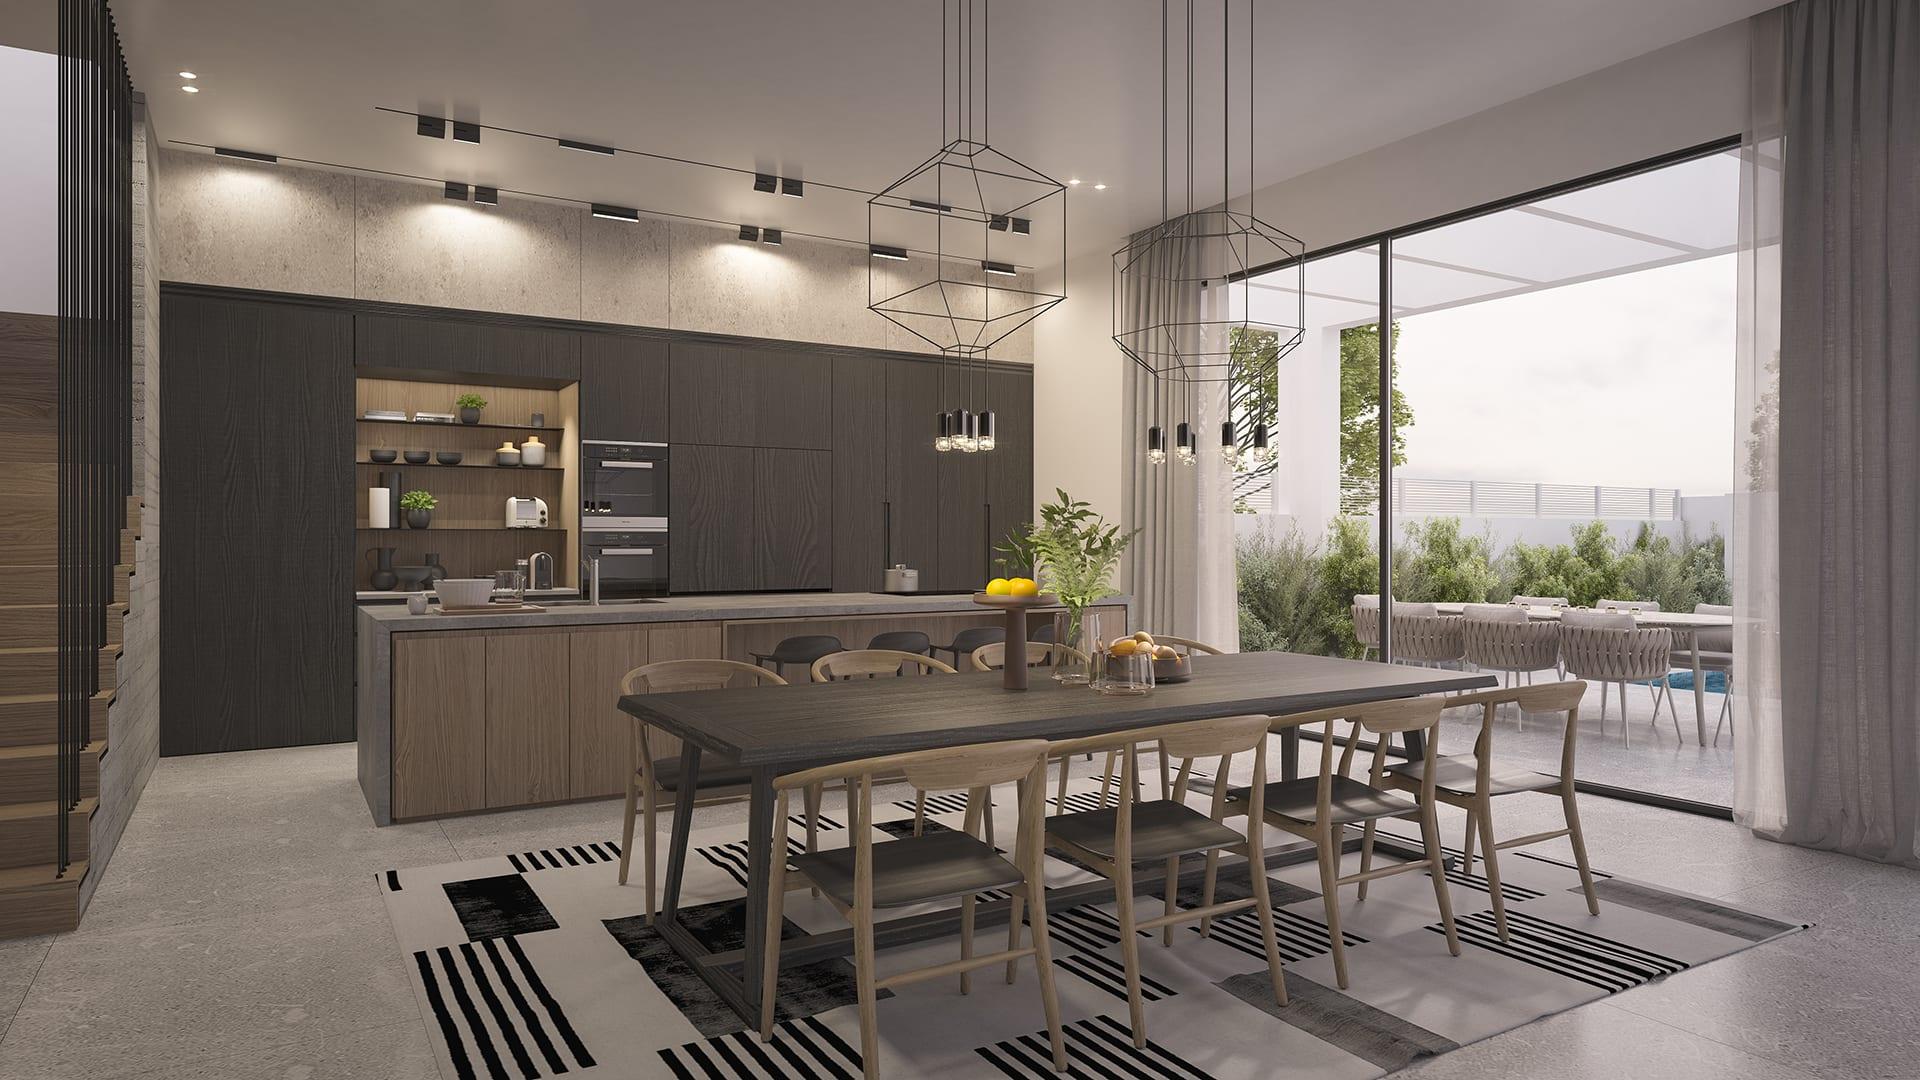 Maayan-Golan_Architectural-Visualization_interior-visualization_private-house_kitchen-dining-room_interior-design-by-sharon-maayan_01